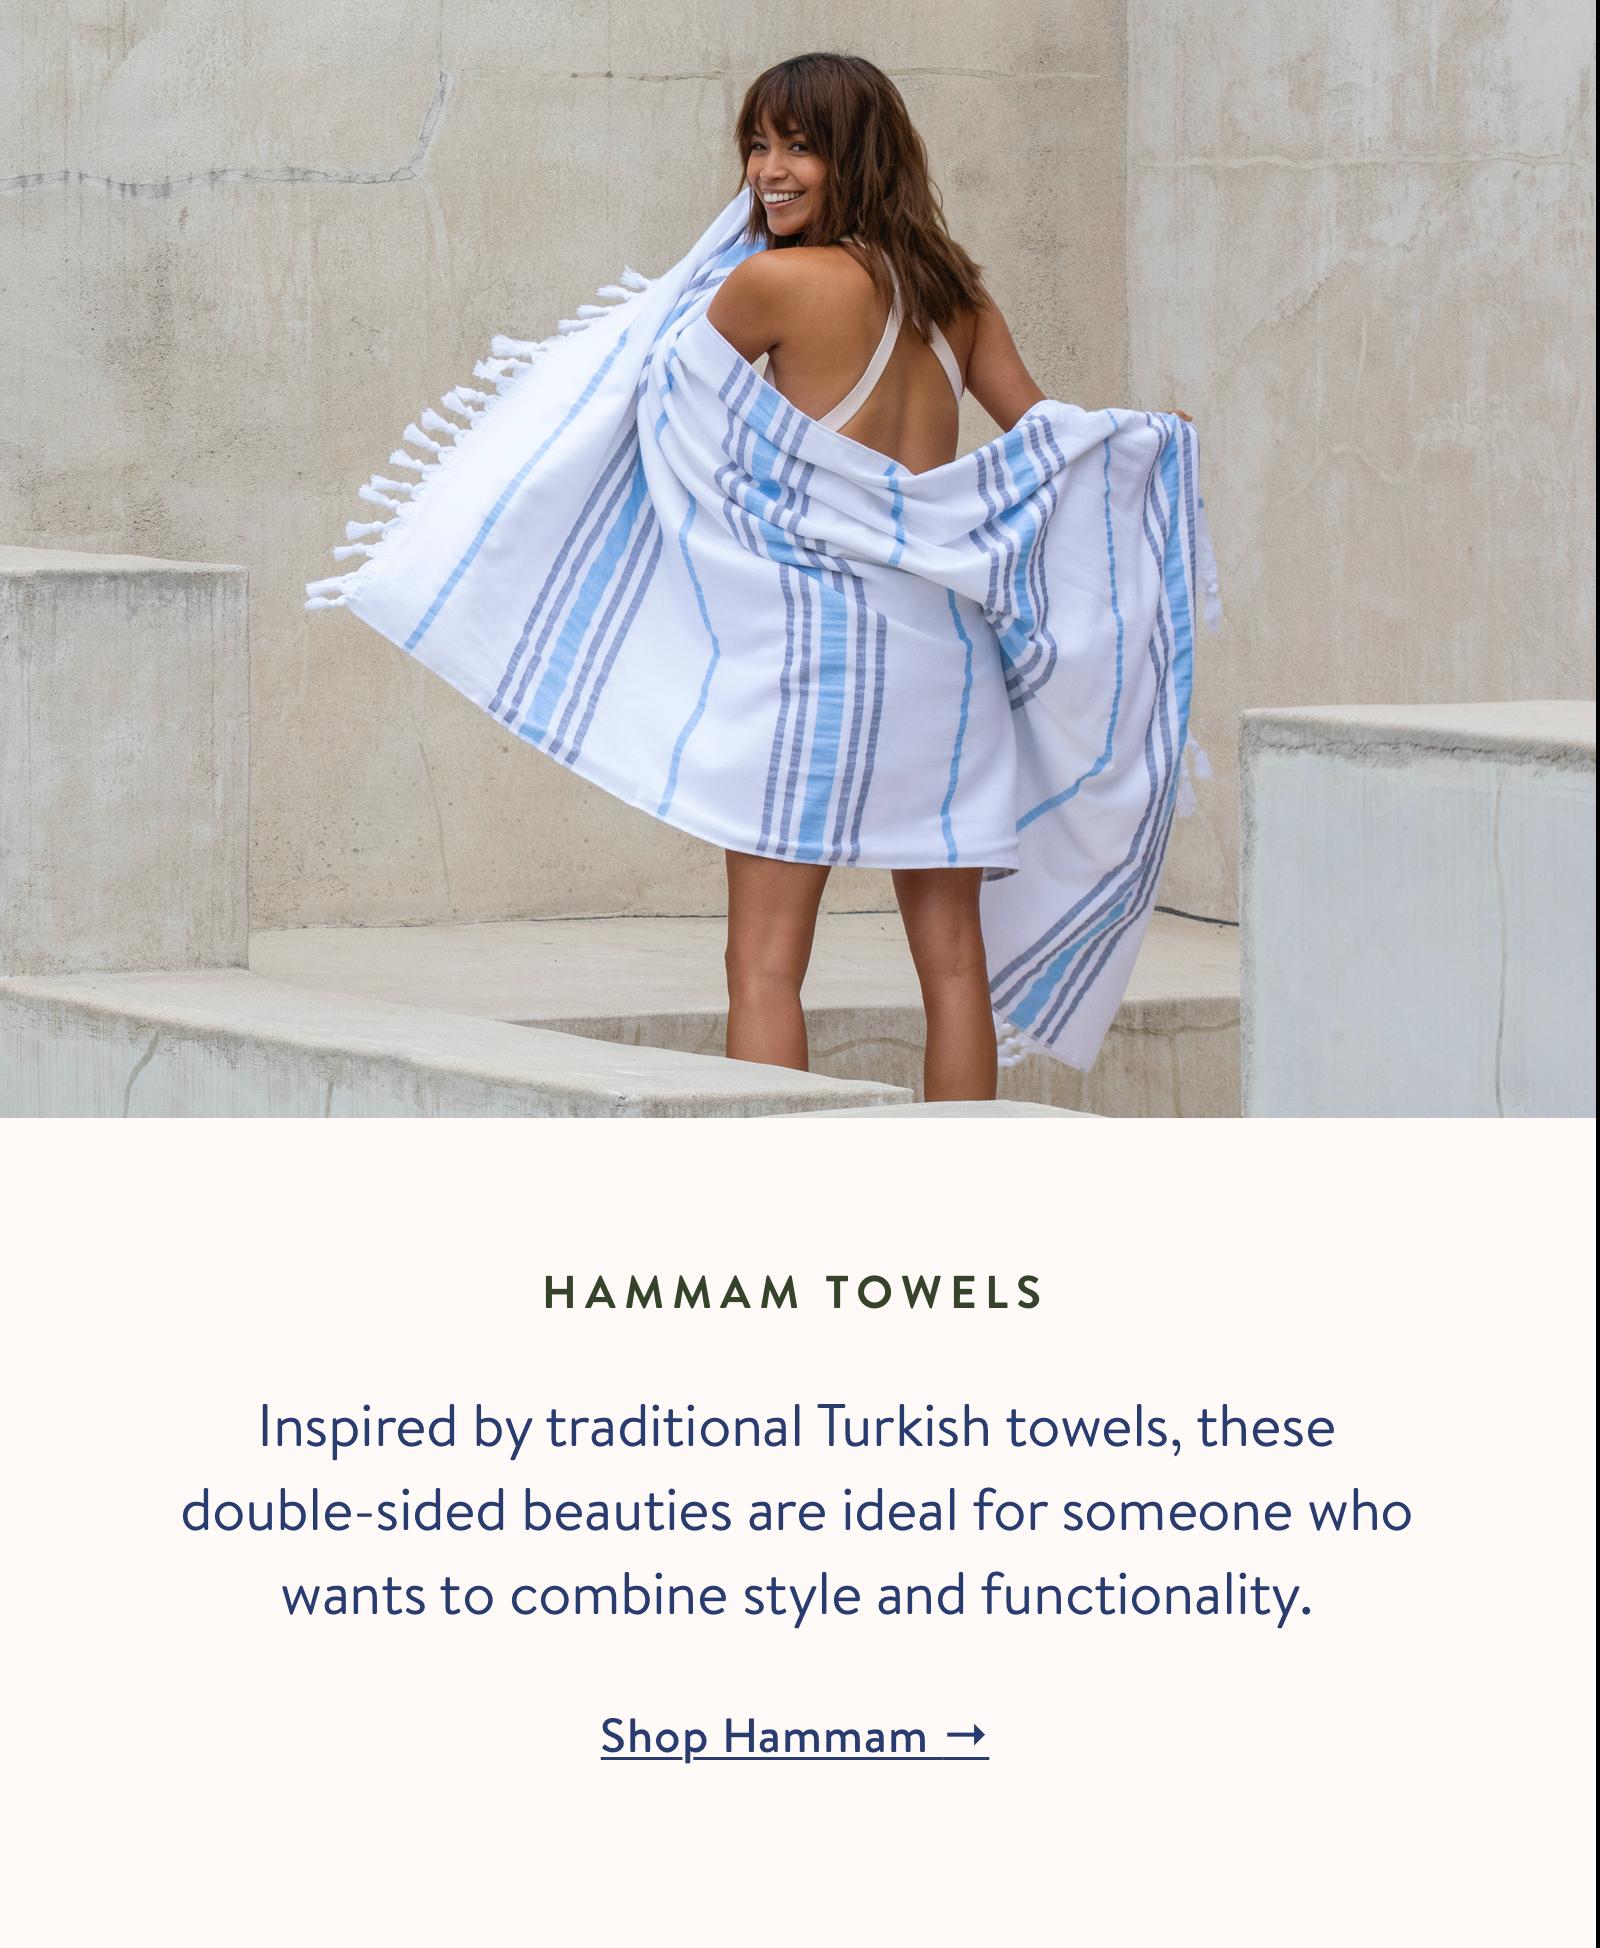 Shop our Hammam Towels